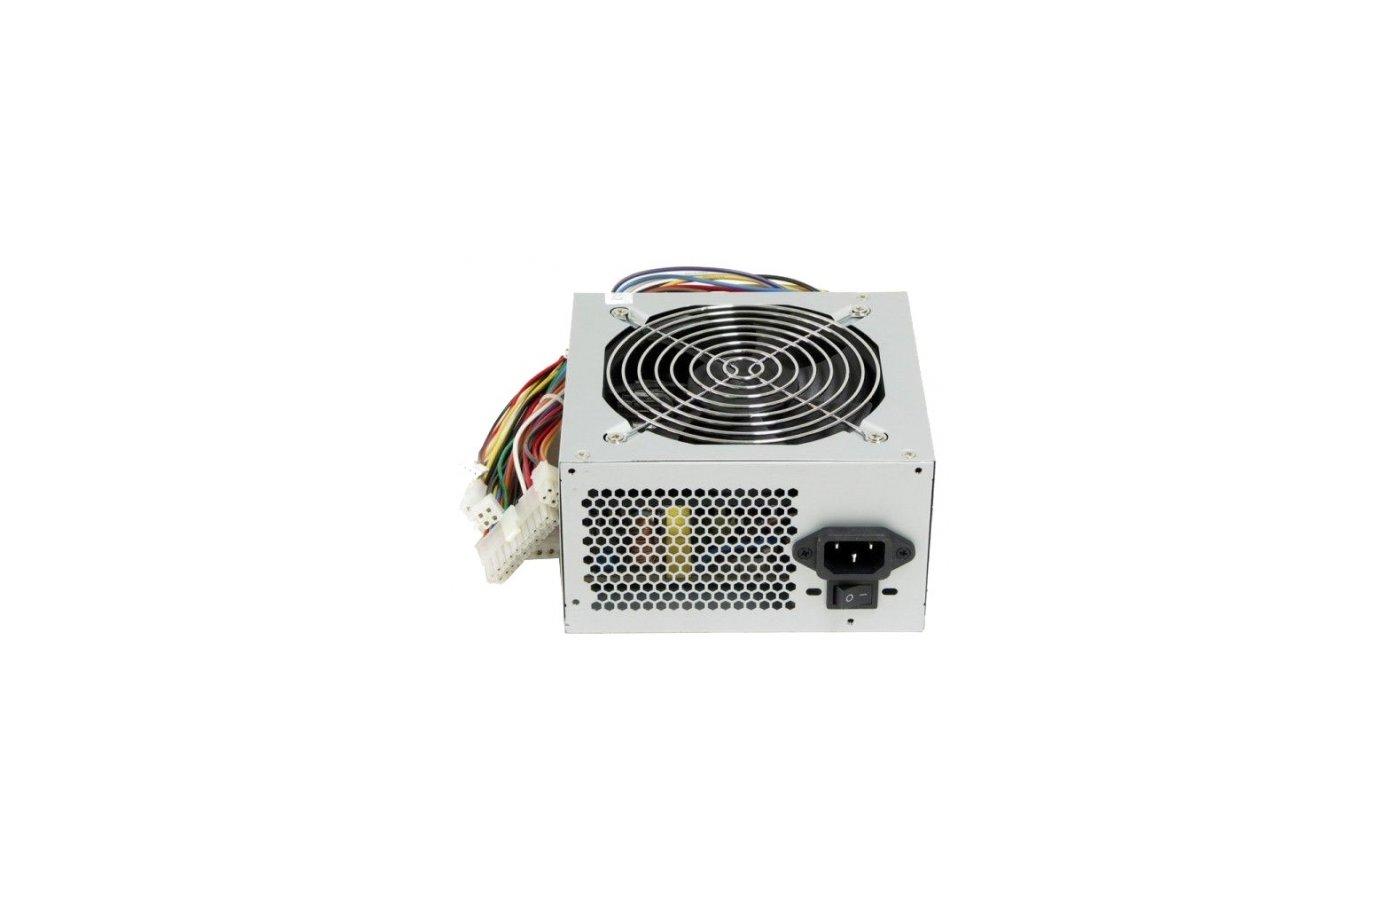 Блок питания LinkWorld ATX 600W LW6-600 (24+4pin) 120mm fan 4xSATA RTL